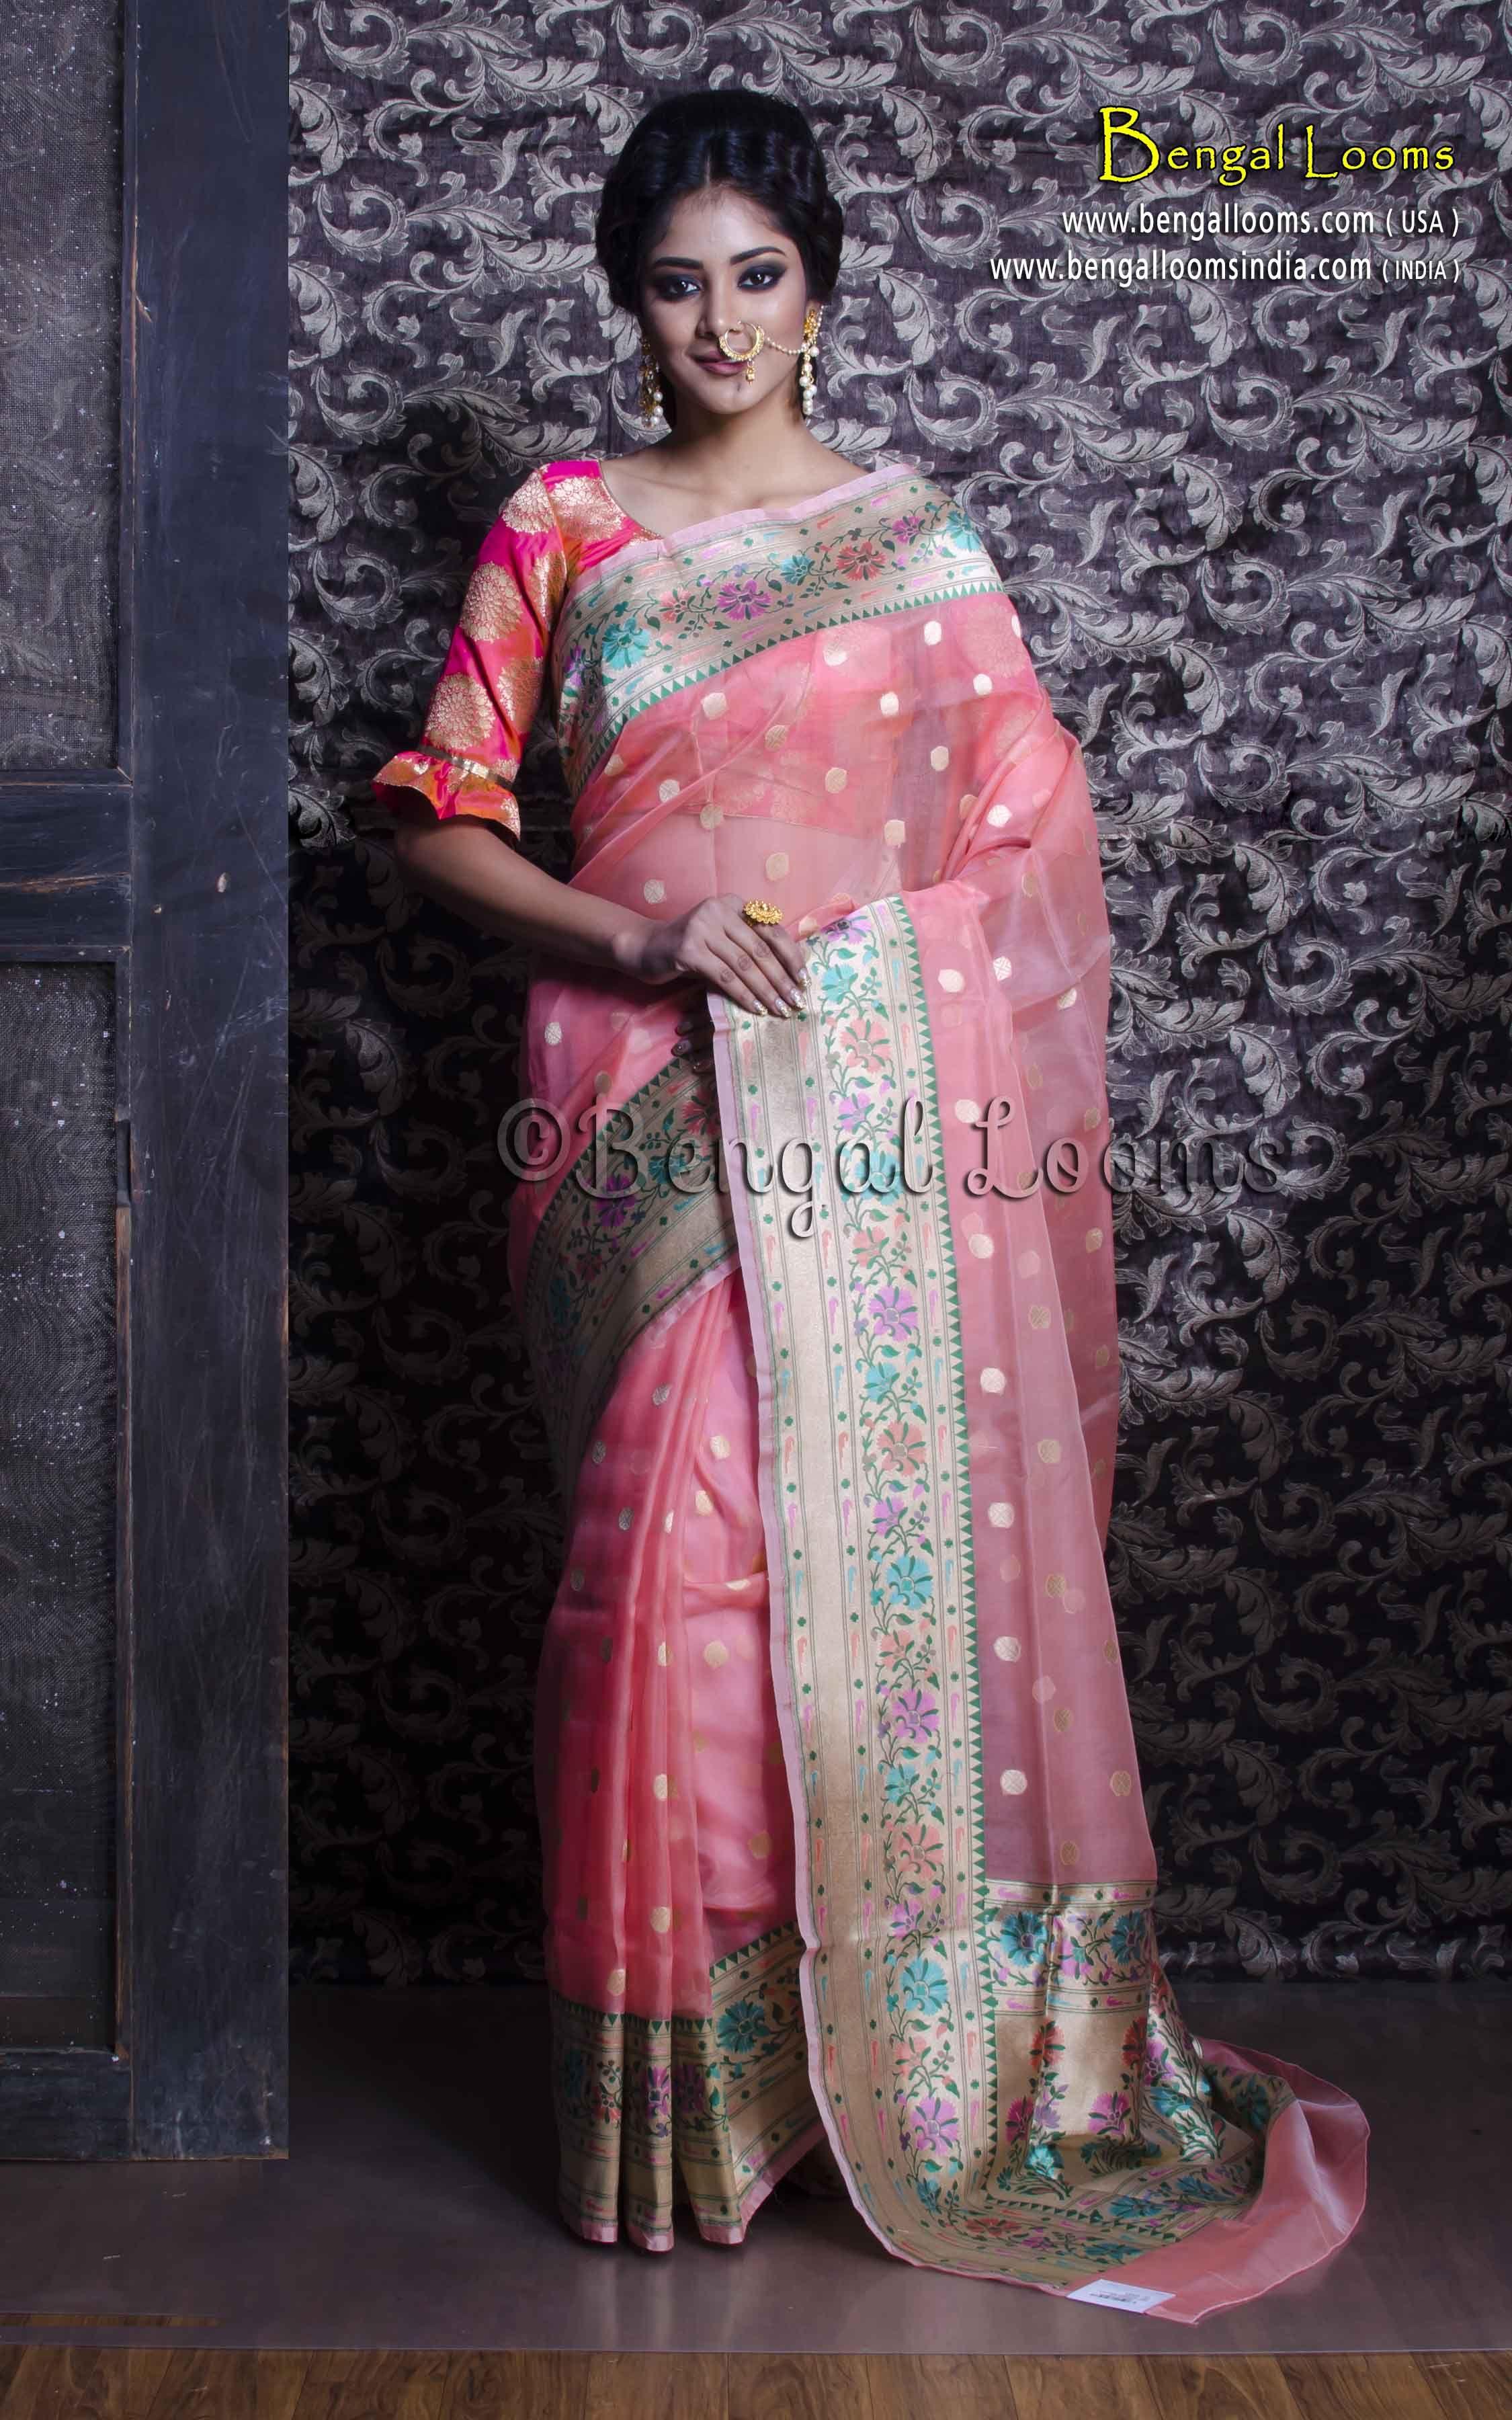 7f3b3f69710be Pure Handloom Kora Silk Banarasi Saree in Baby Pink and Muted Gold ...